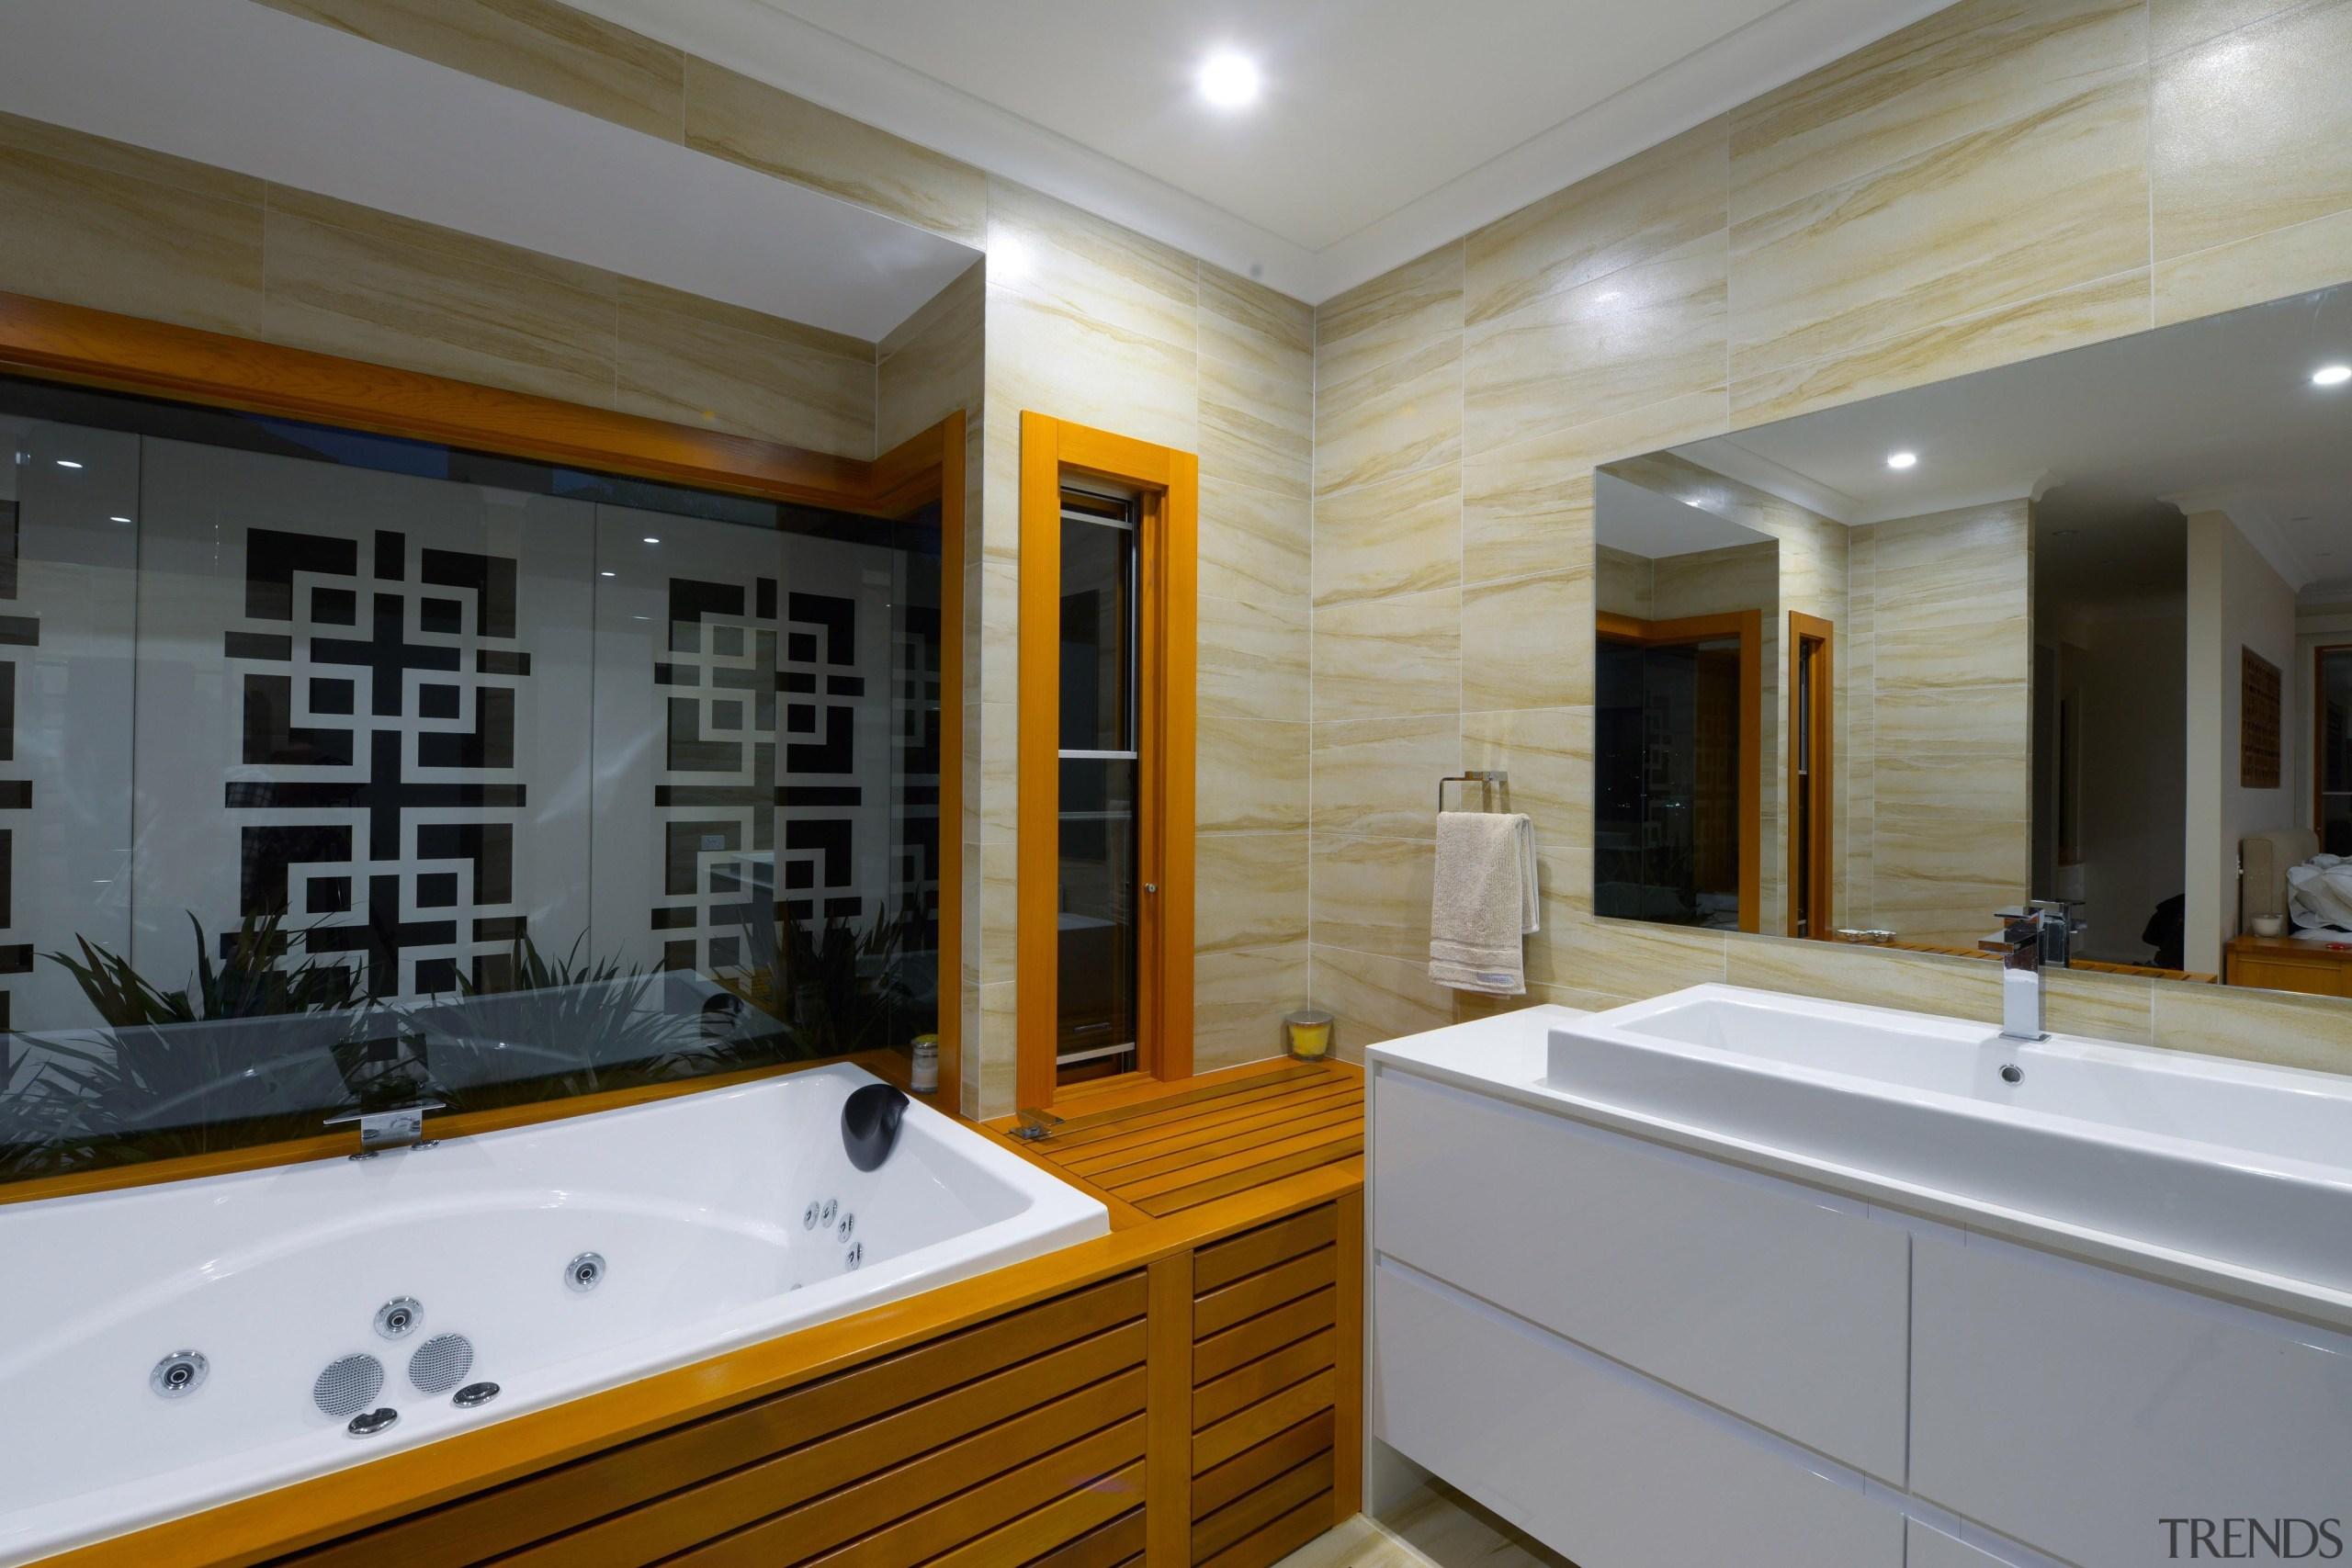 Winner Bathroom Design of the Year 2013 Hunter bathroom, bathtub, ceiling, estate, home, interior design, property, real estate, room, gray